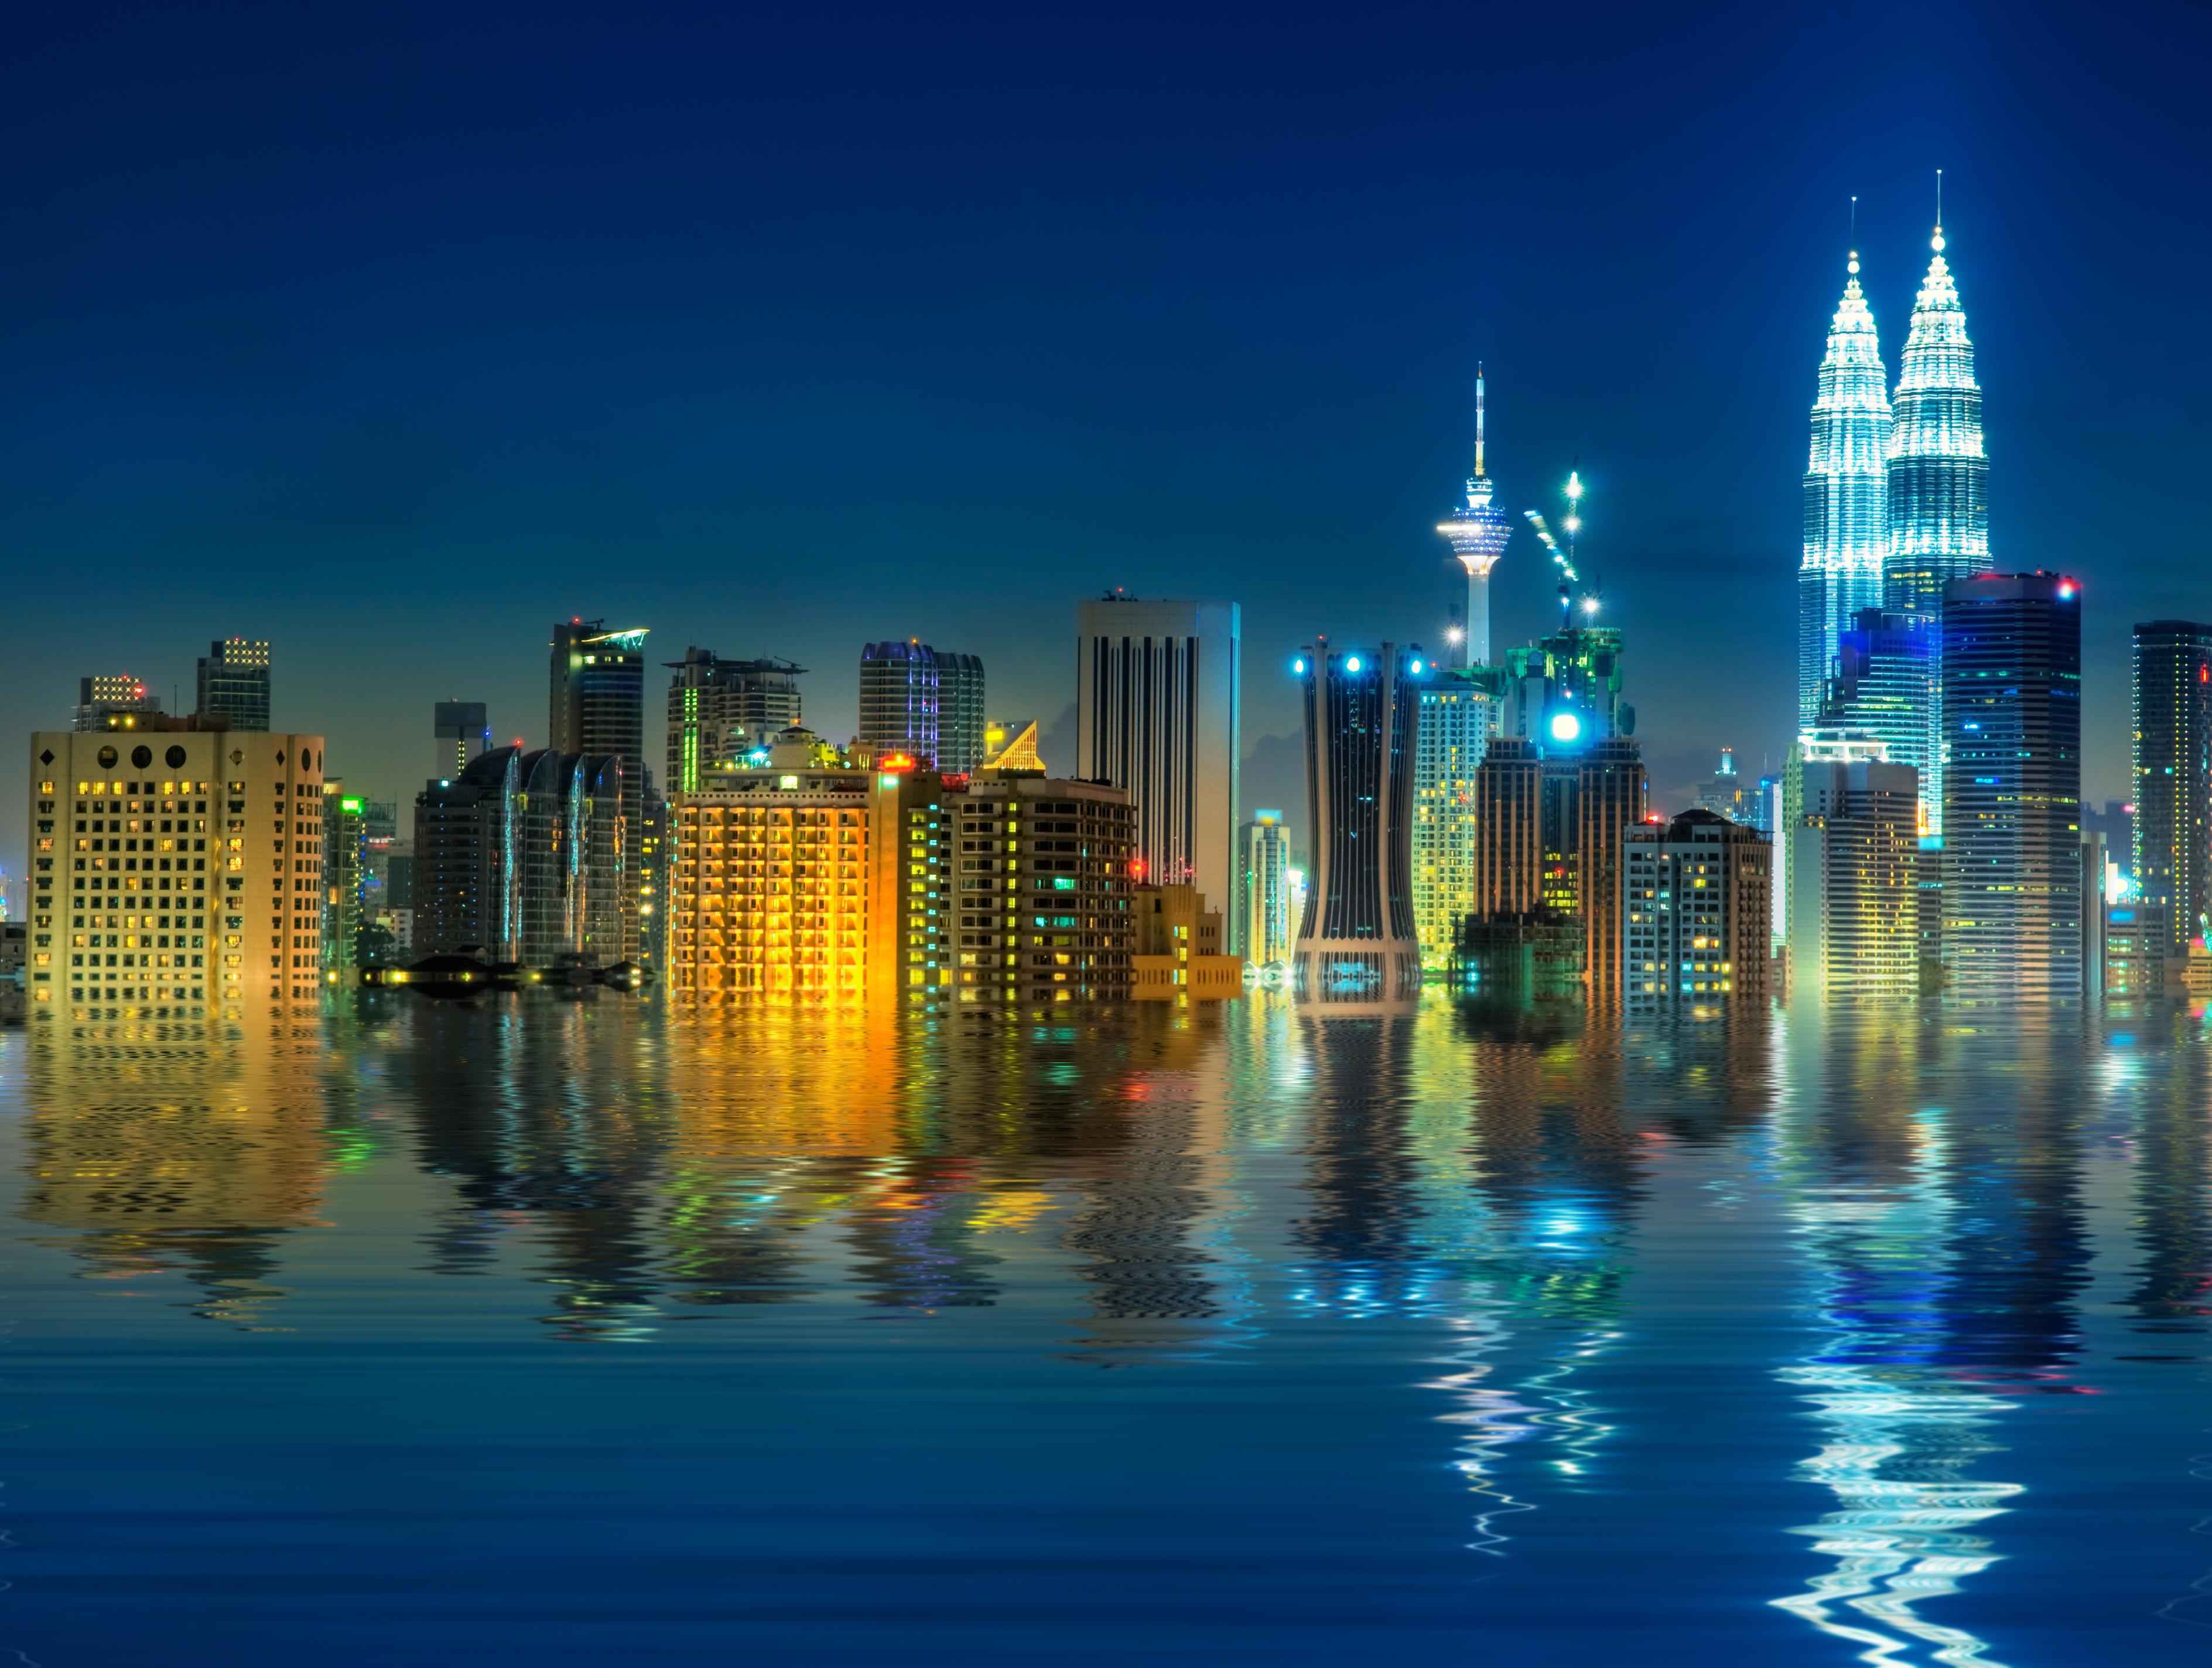 Kuala Lumpur skyline at night, Malaysia, Asia Pacific